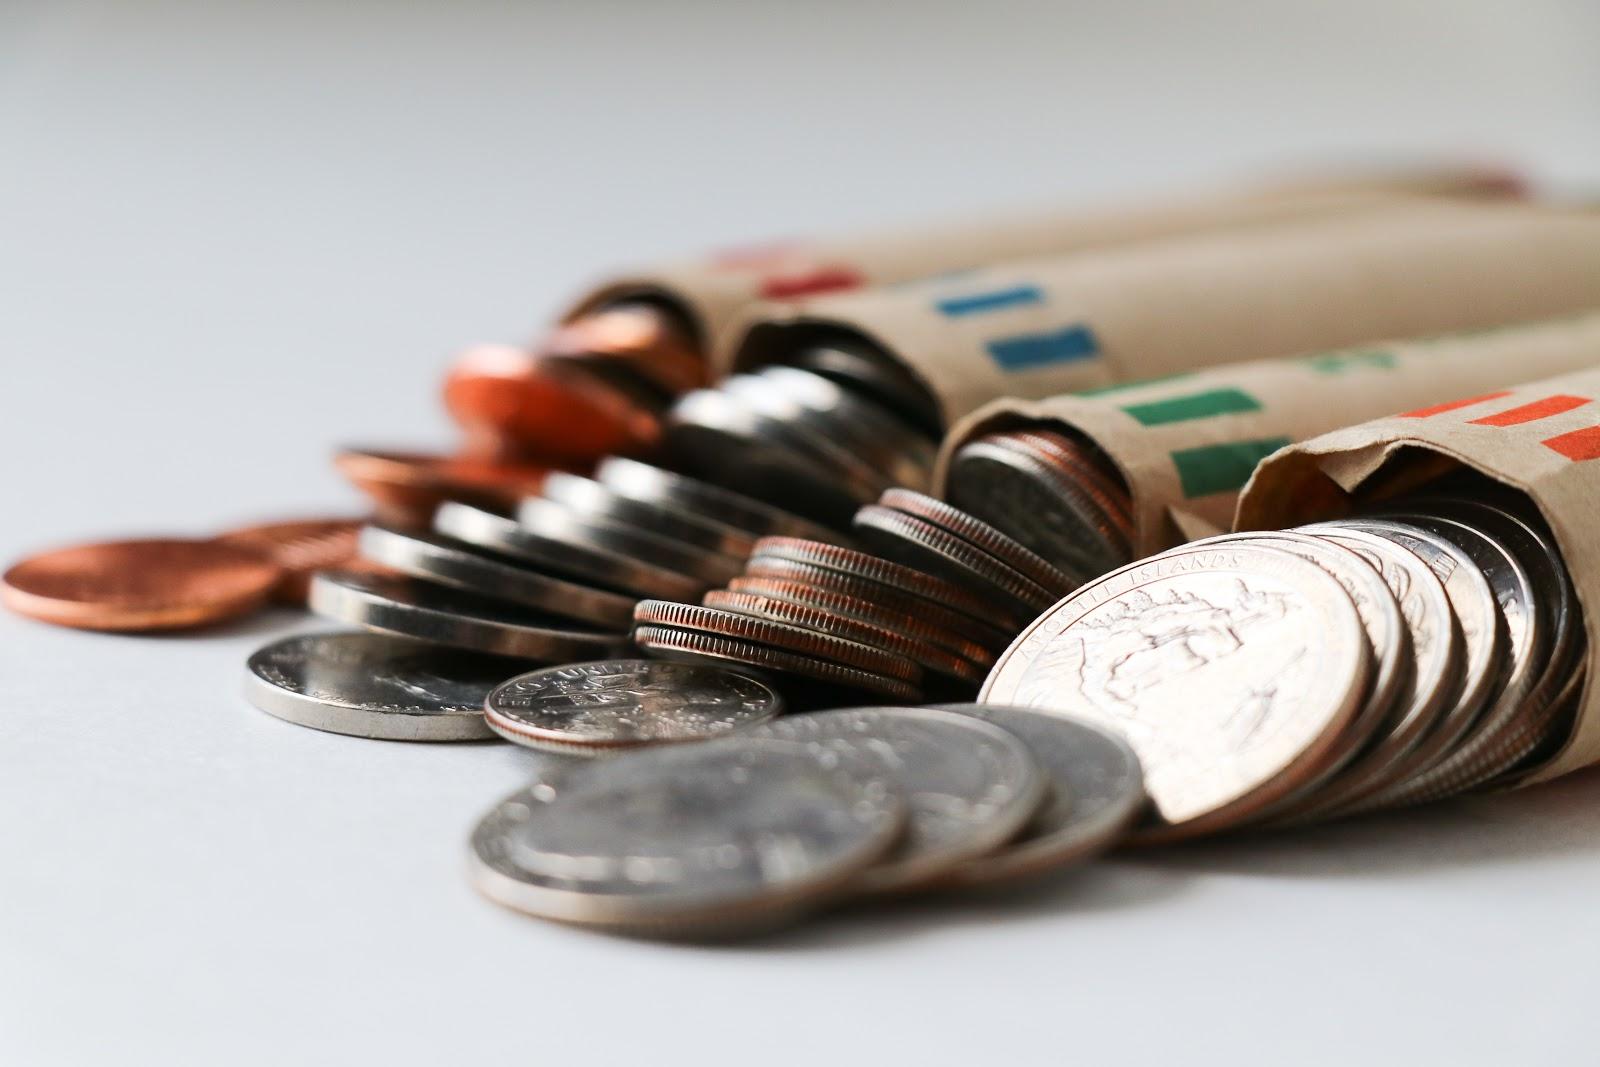 Money tubes